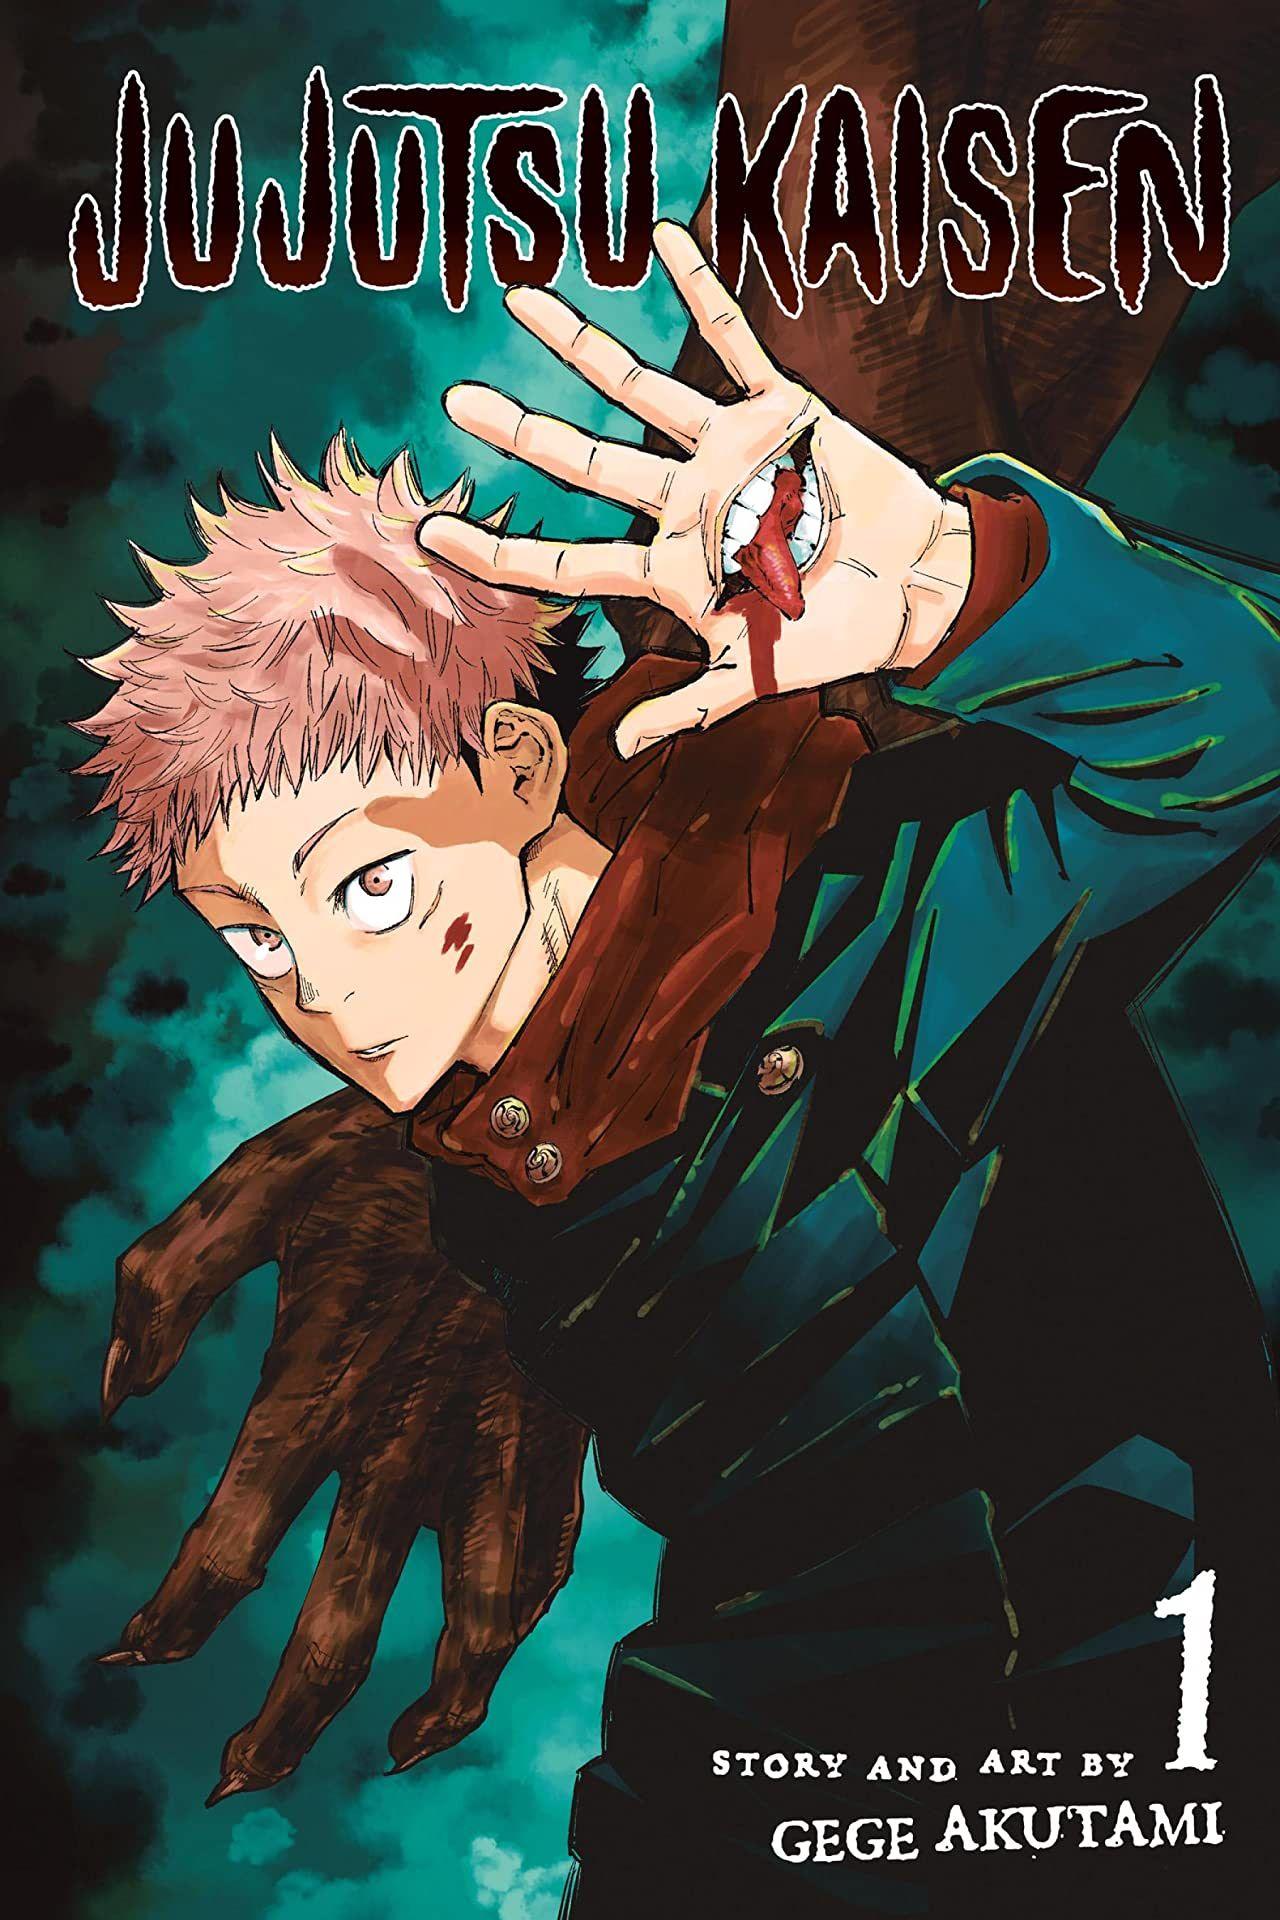 Jujutsu Kaisen Vol 1 Manga Covers Manga Anime Anime Printables